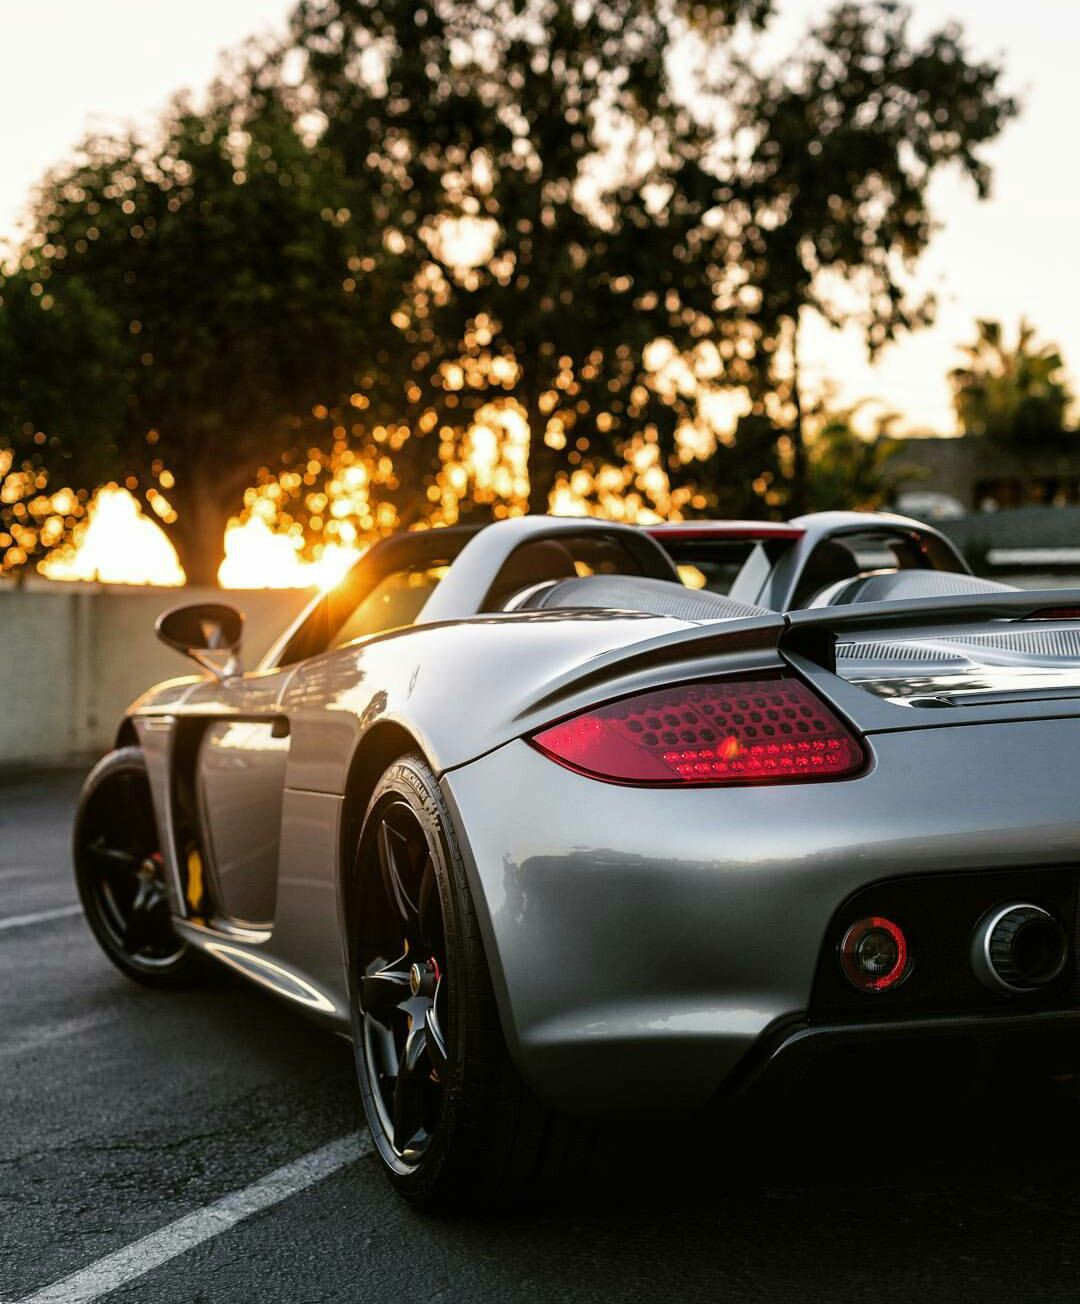 Porsche Carrera GTTap The Link Now For More Information On - Porsche roadside assistance